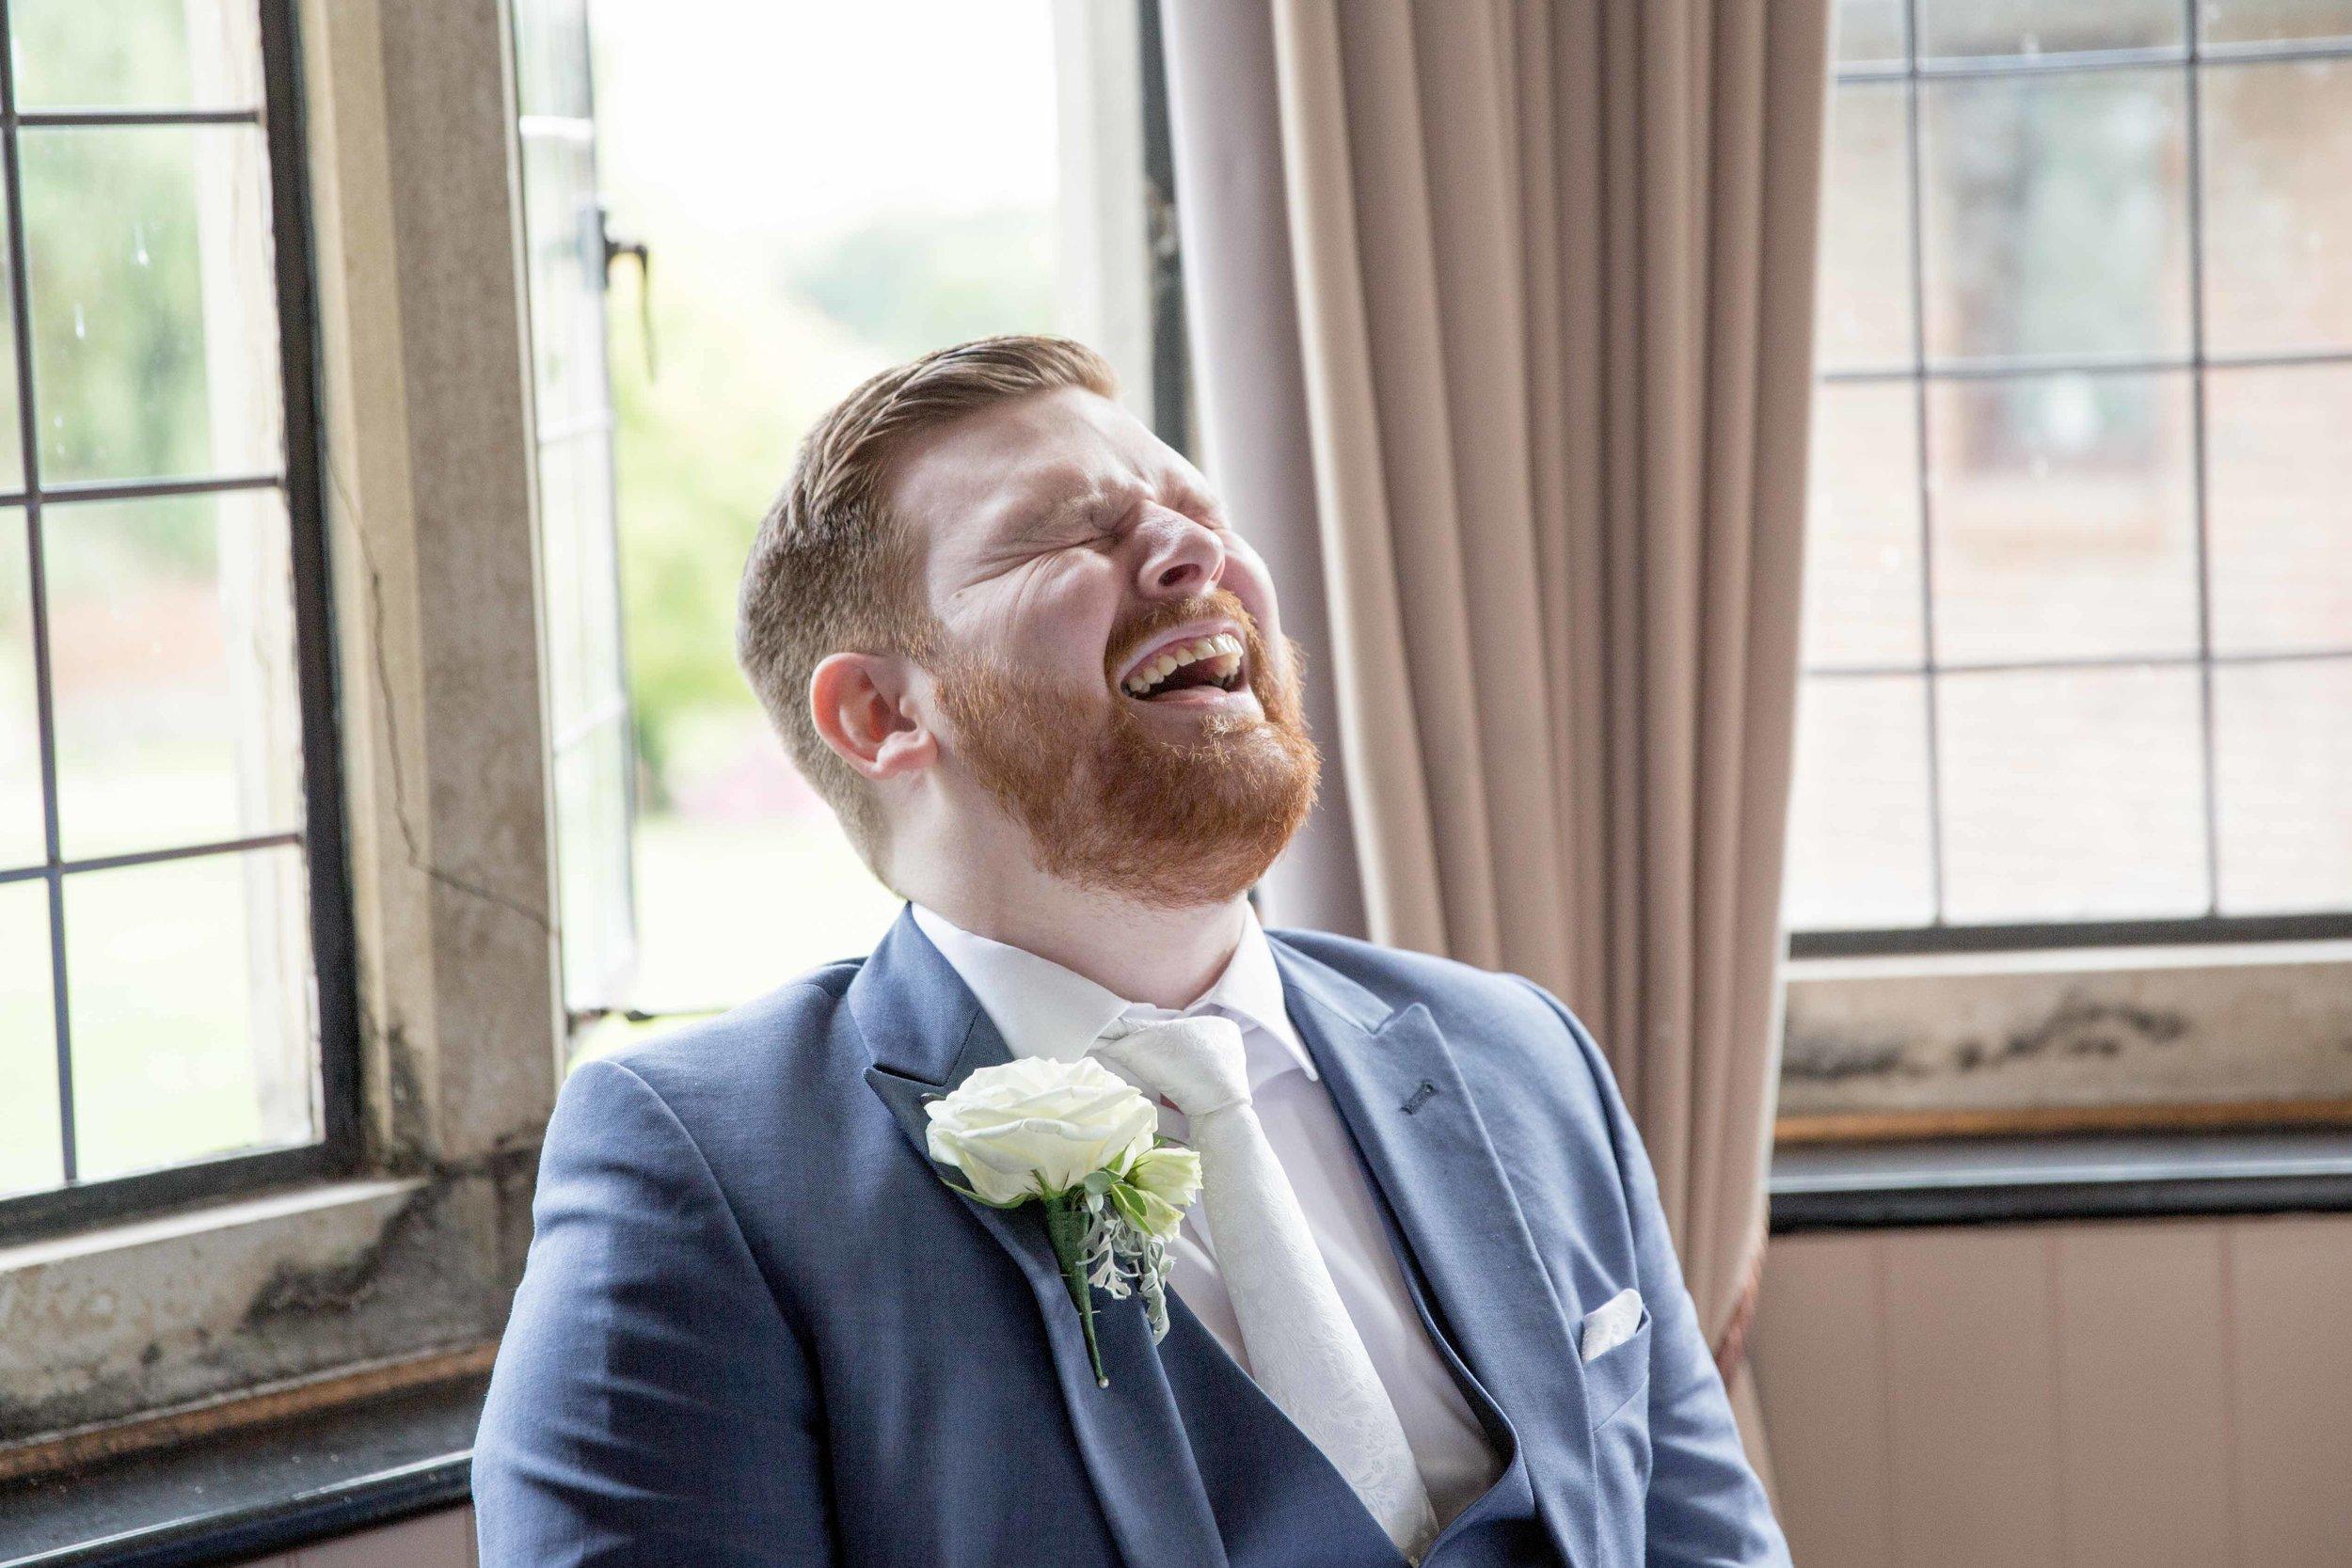 cotswold-wedding-photography-at-stonehouse-court-hotel-natalia-smith-photography-gloucestershire-wedding-photographer-83.jpg